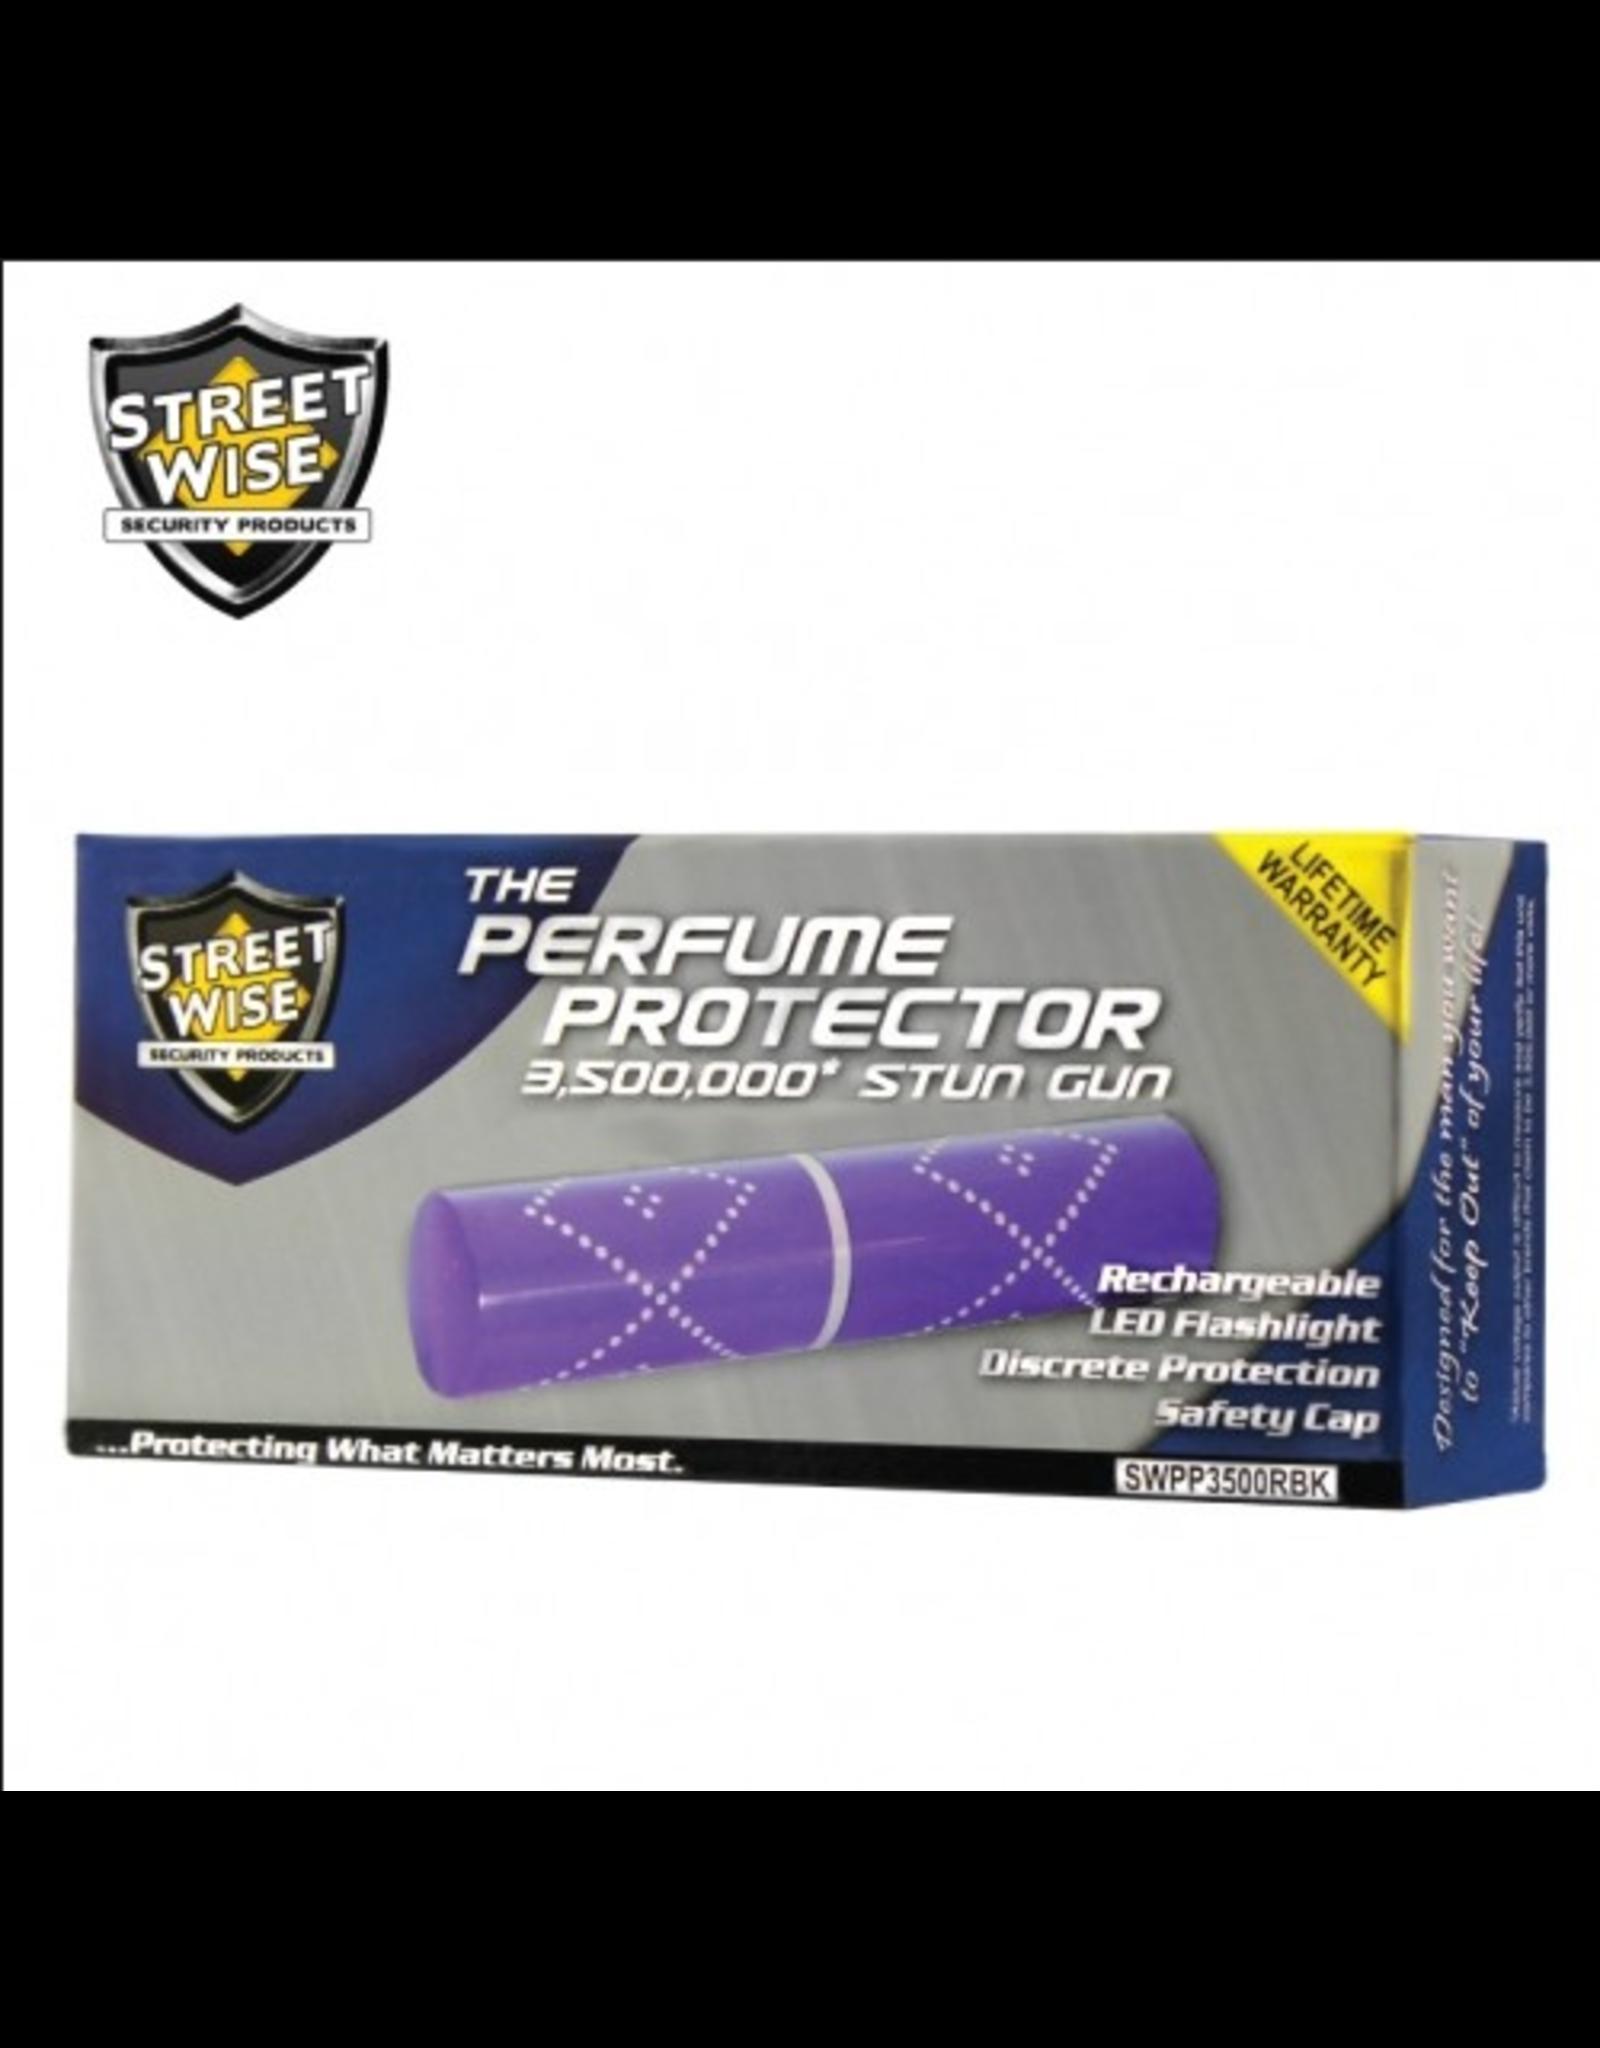 Street Wise Street Wise Perfume Protector Stun Gun 17.000.000